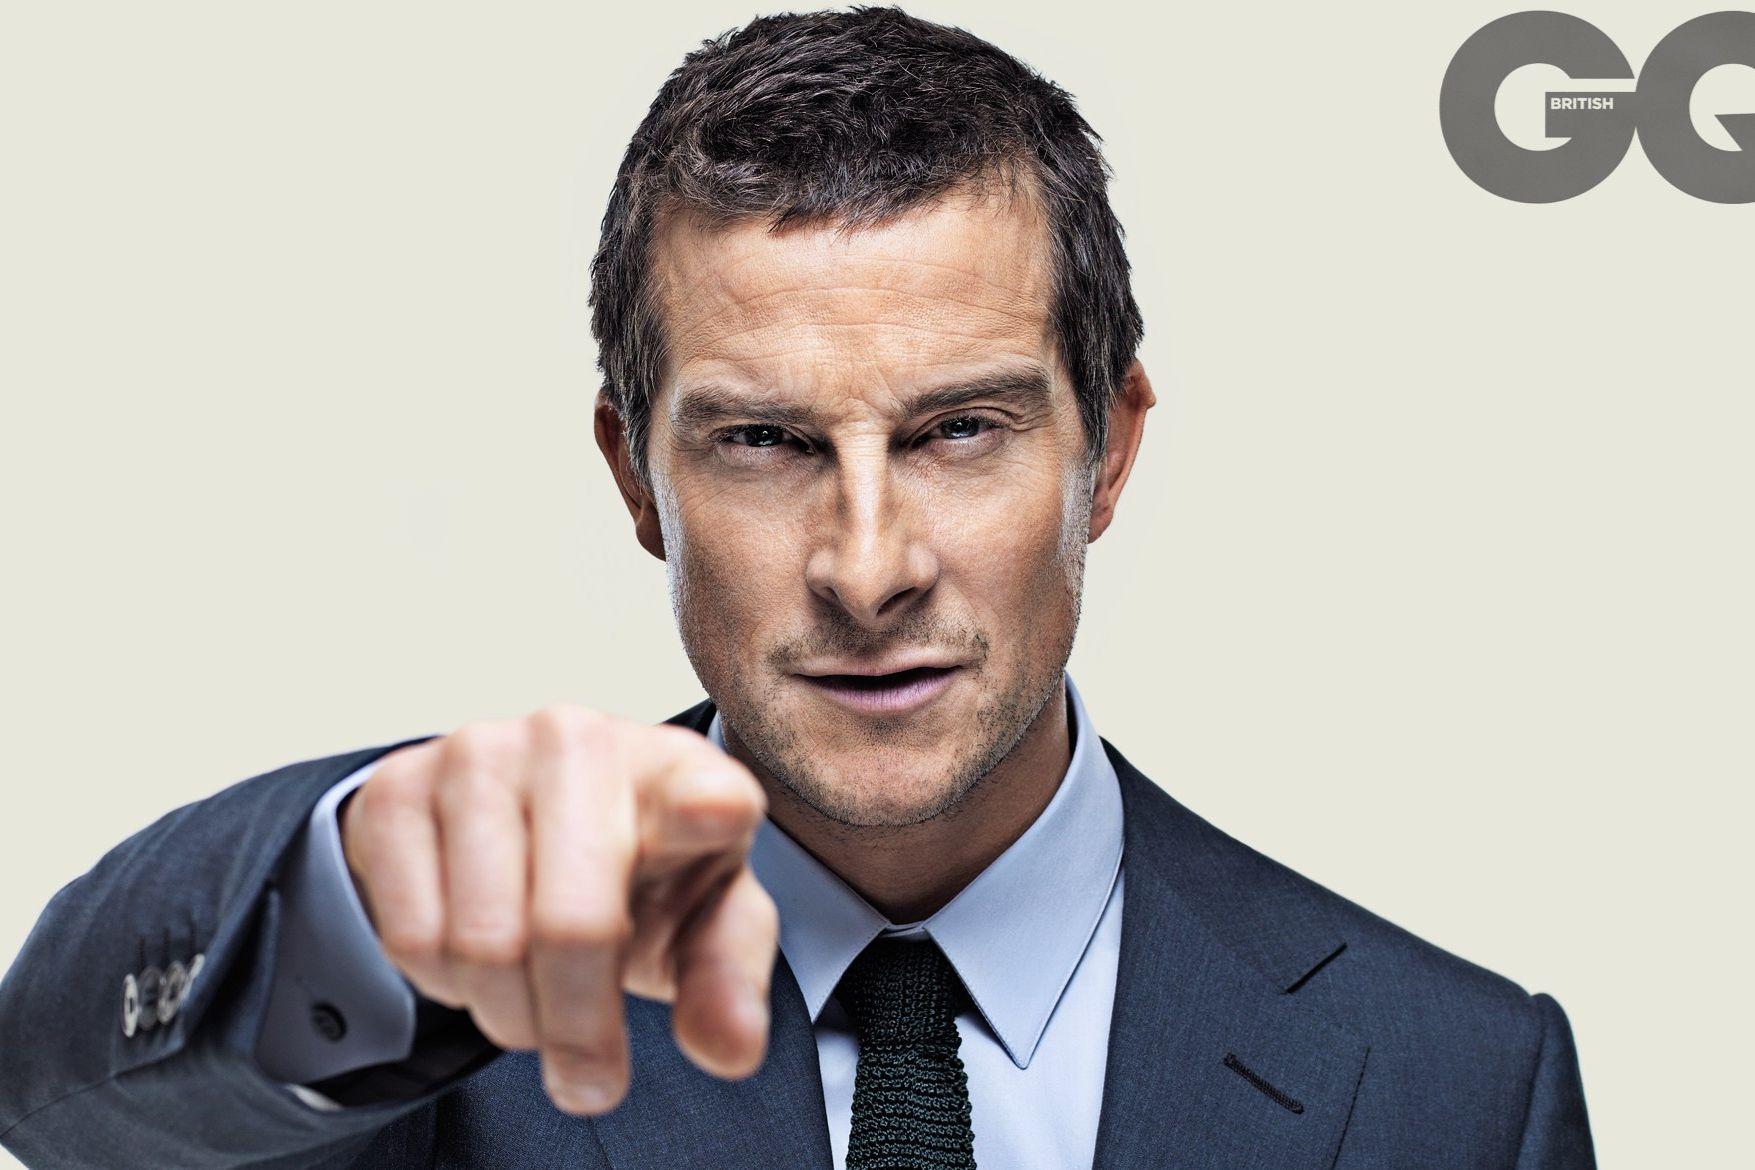 bear grylls skills how to motivate your team british gq